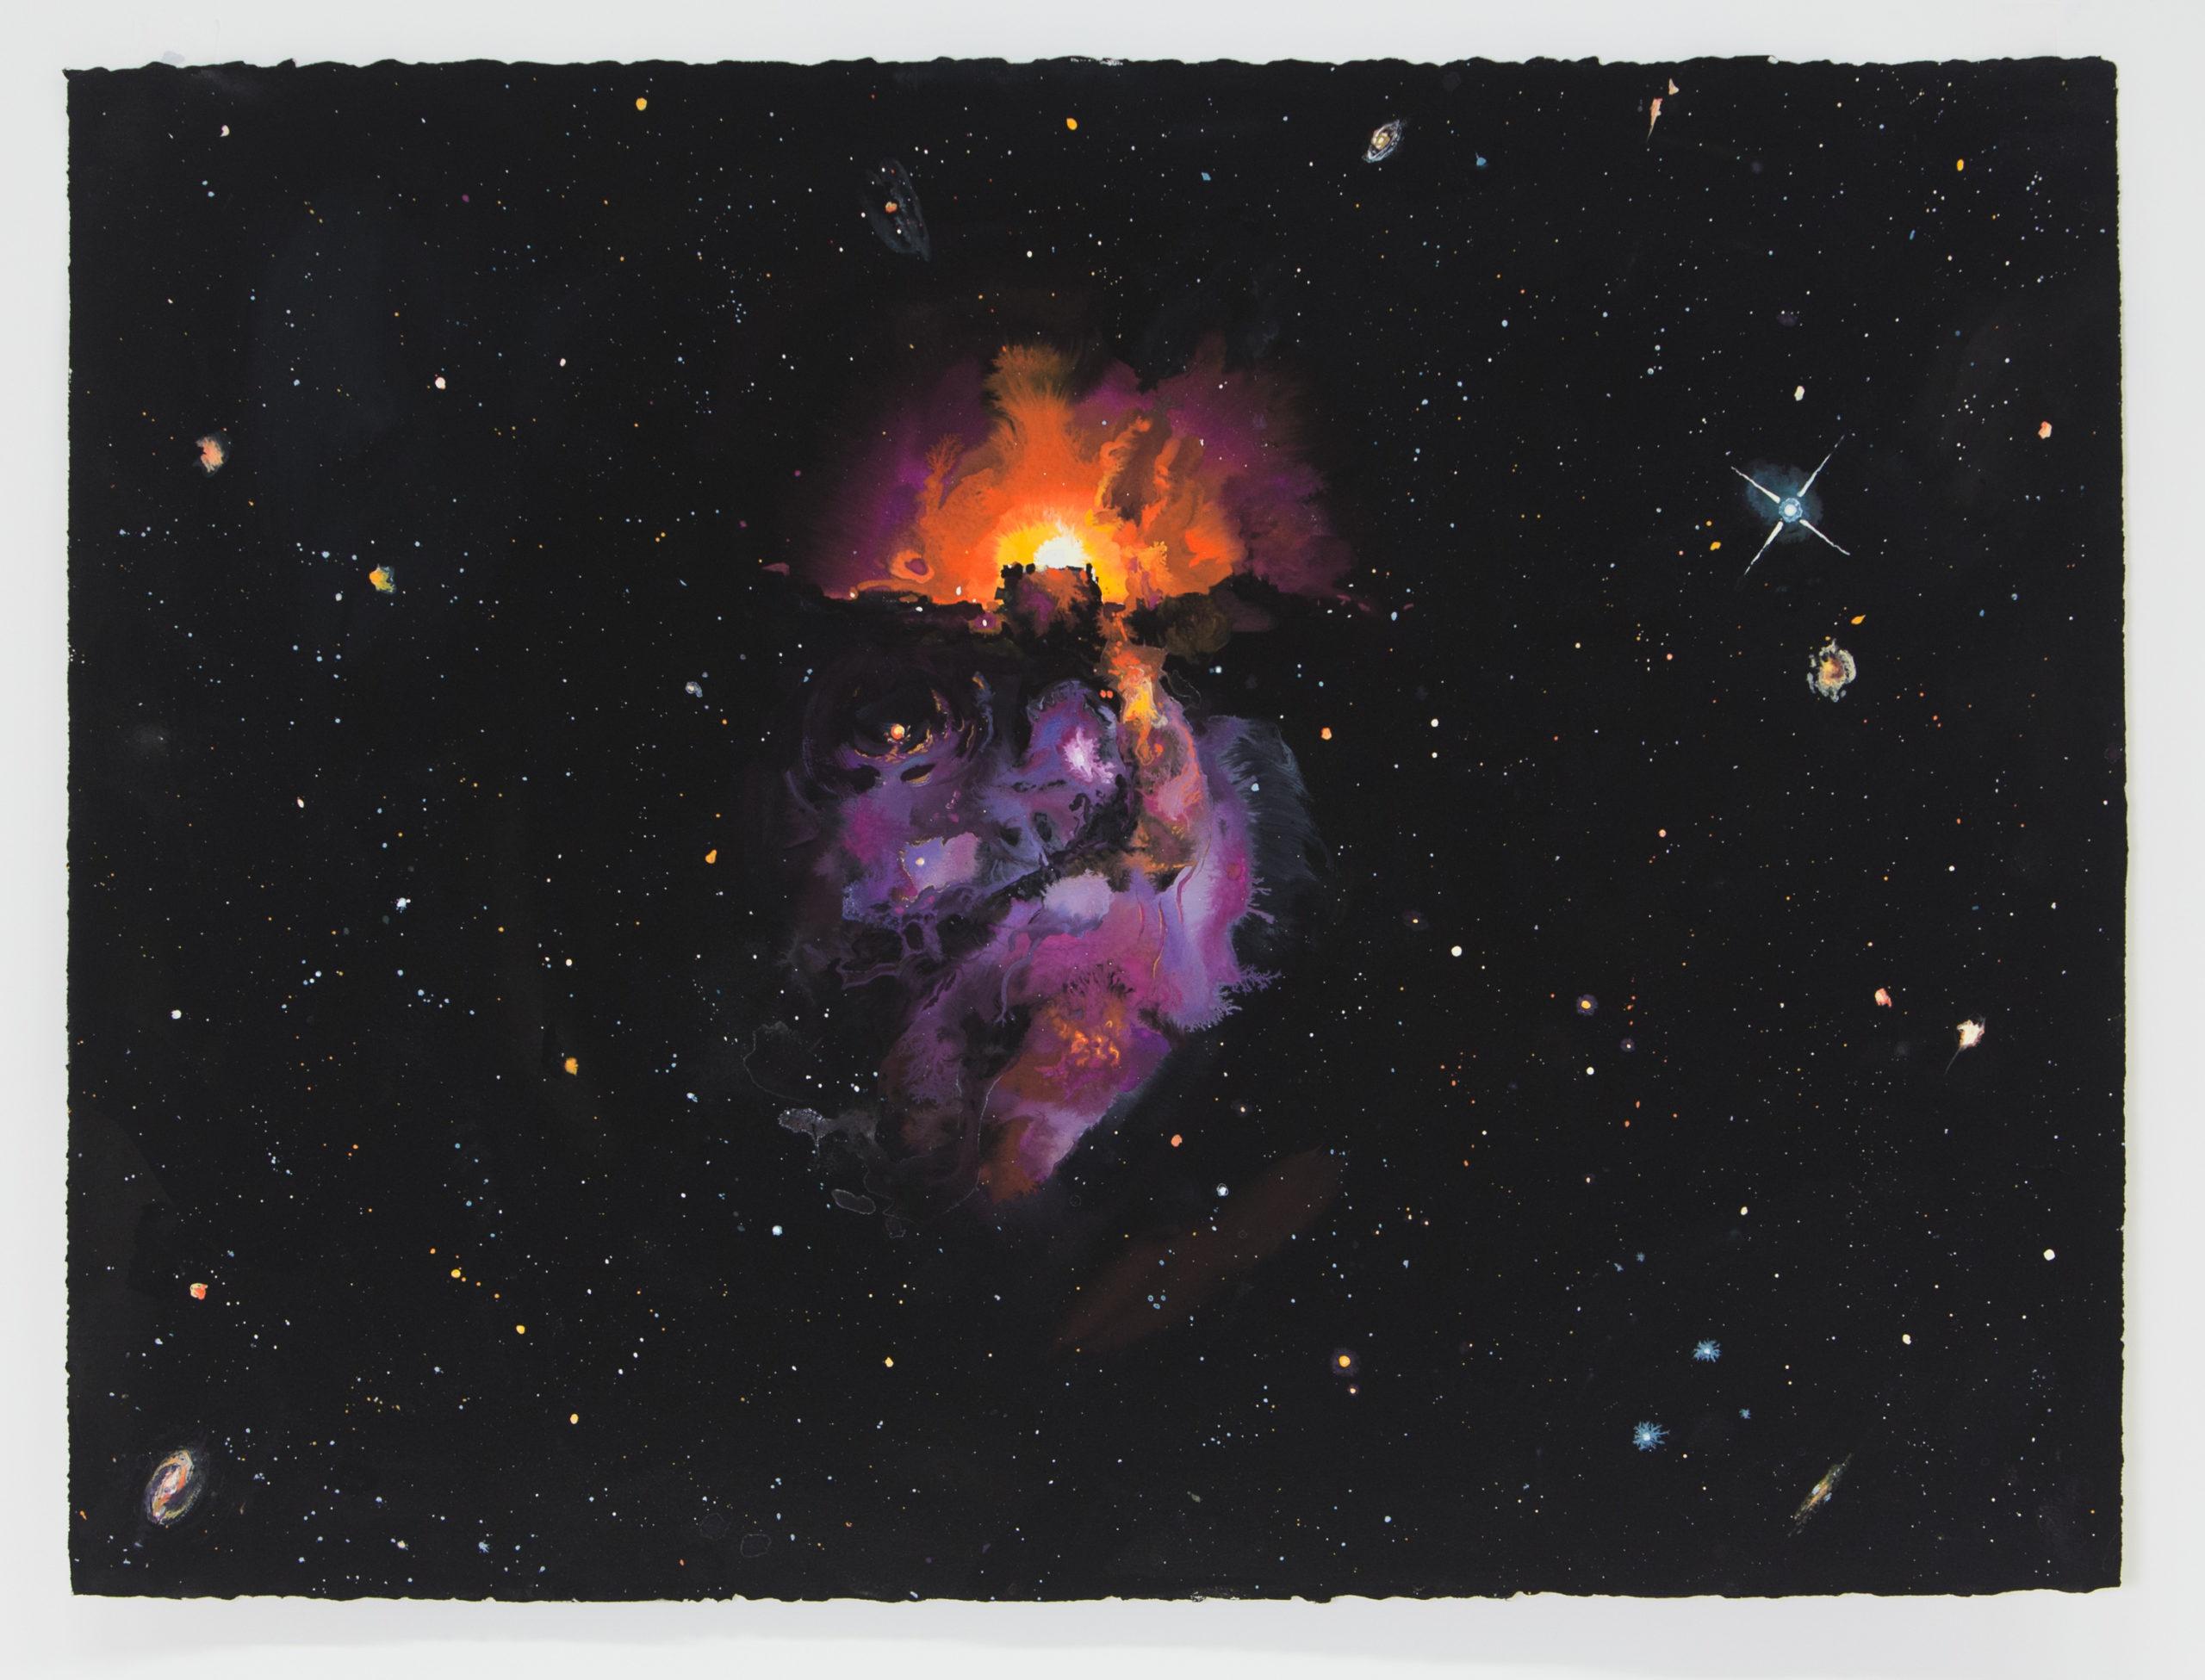 NGC 525, Omar Khouri, 2021. Gouache on Paper, 57.5 cm x 77.5 cm